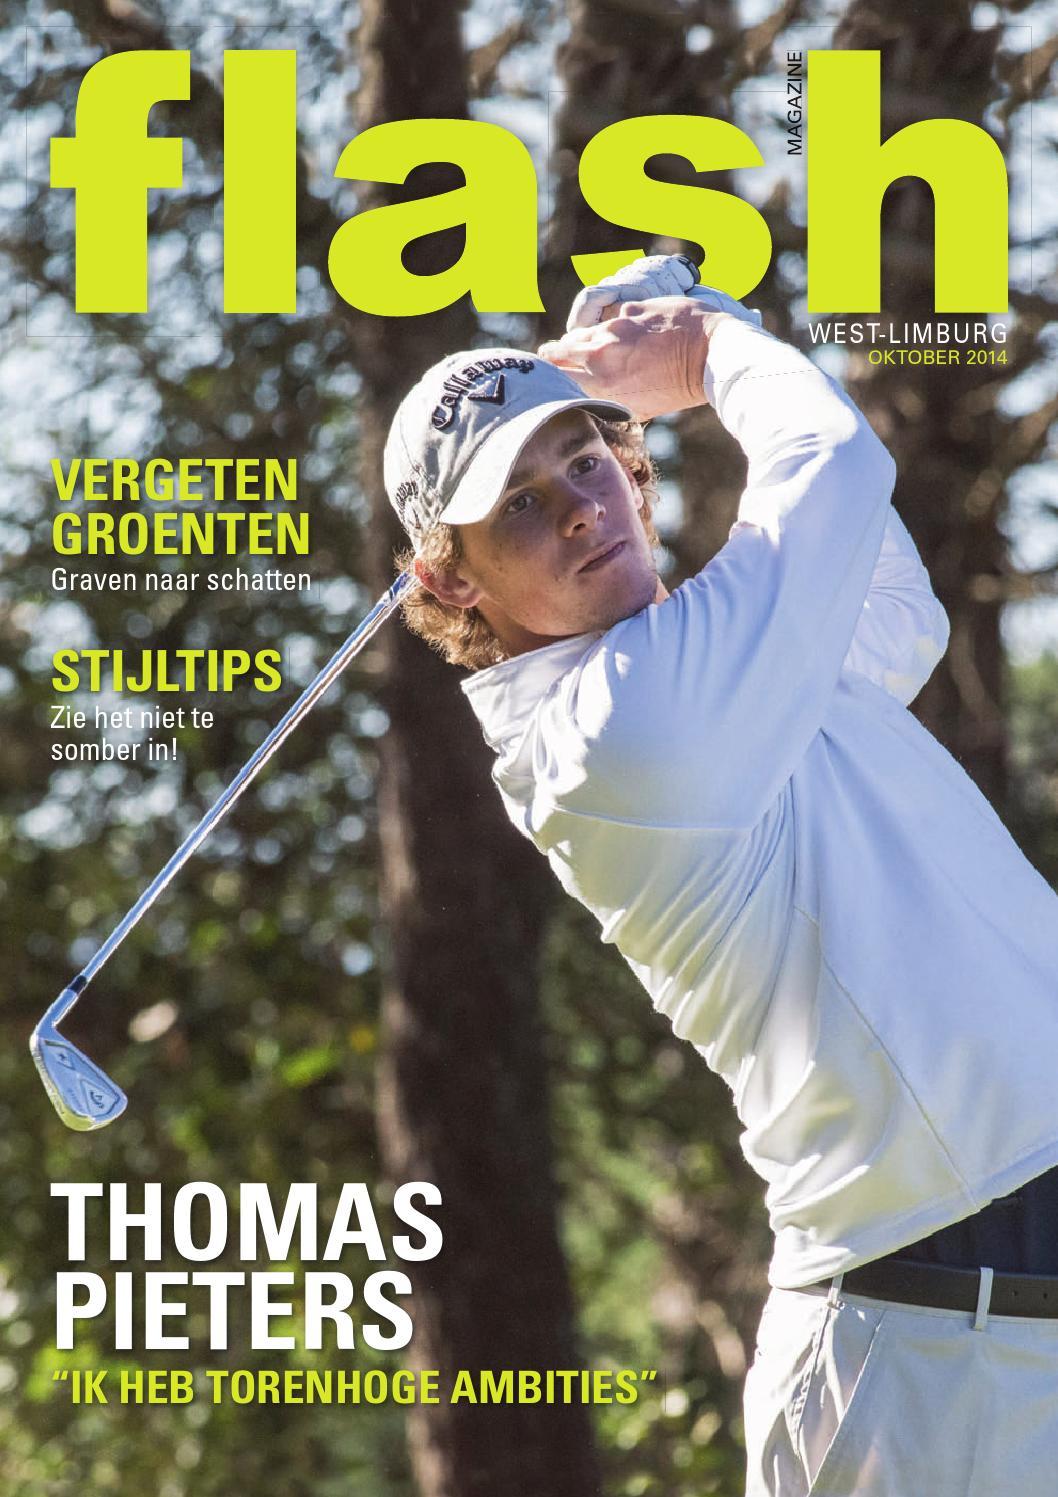 Flash Magazine West Limburg Oktober 2014 By Uitgeverij Intermedia Issuu